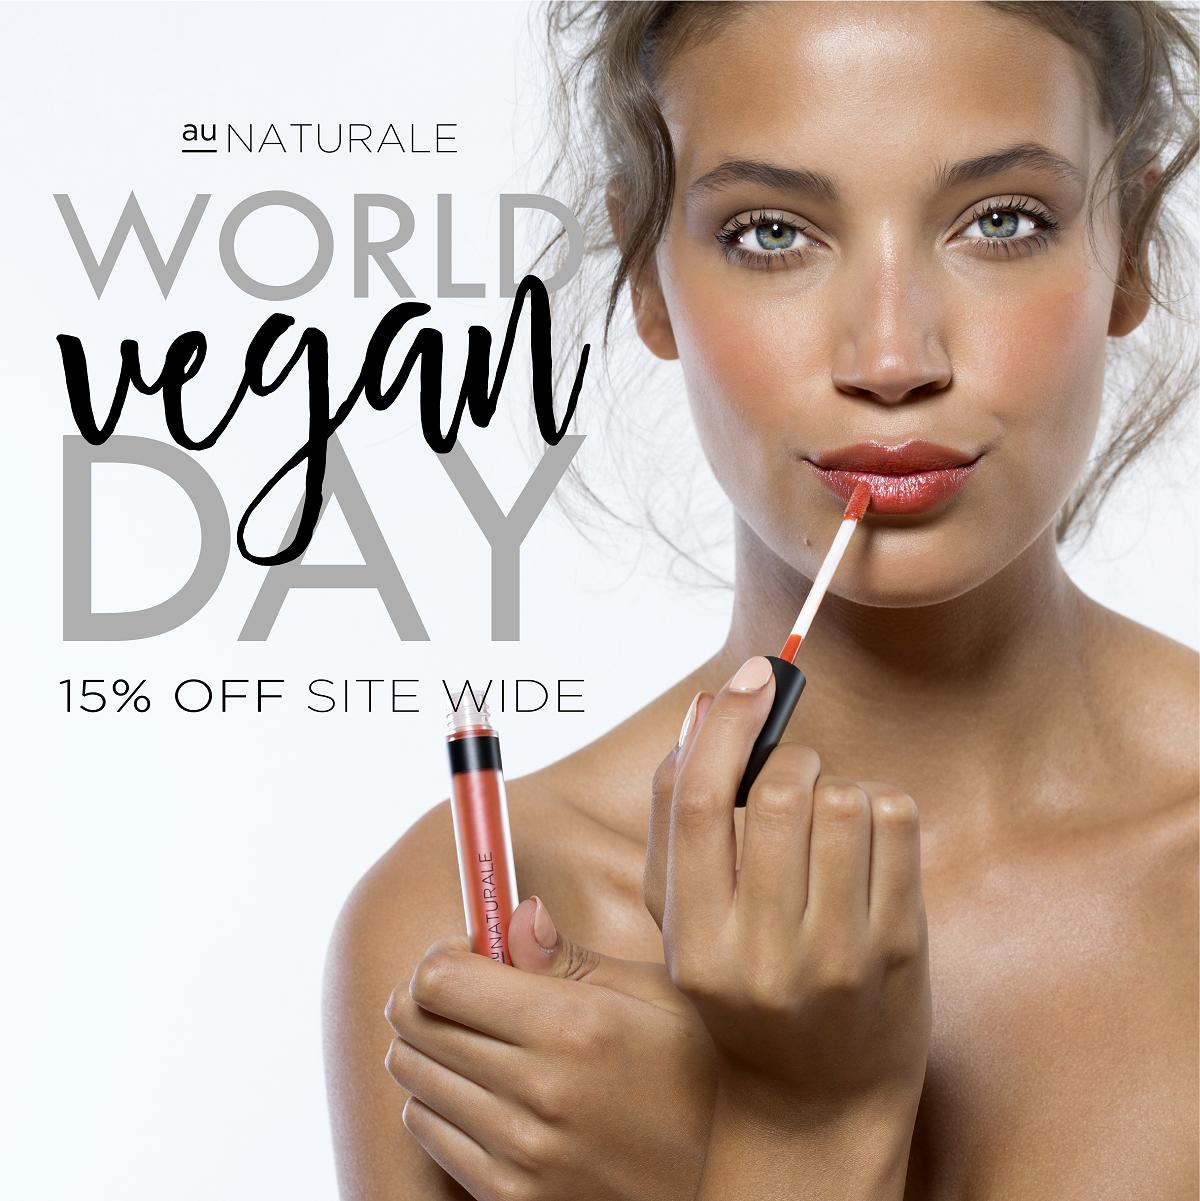 au naturale vegan makeup